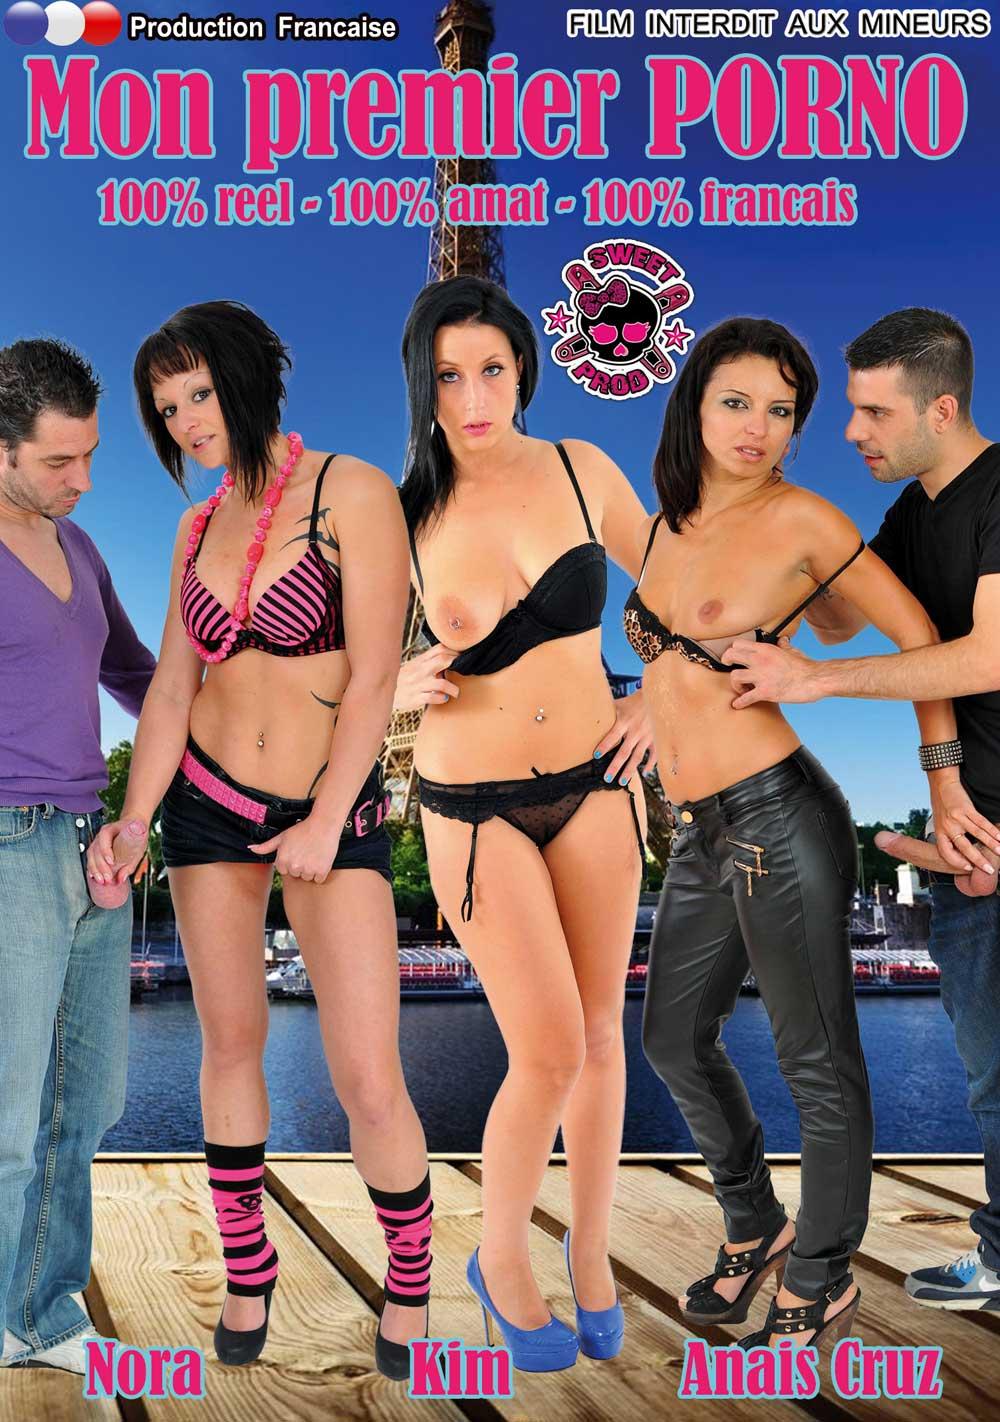 Jai tourn mon premier porno sur le forum Blabla 15-18